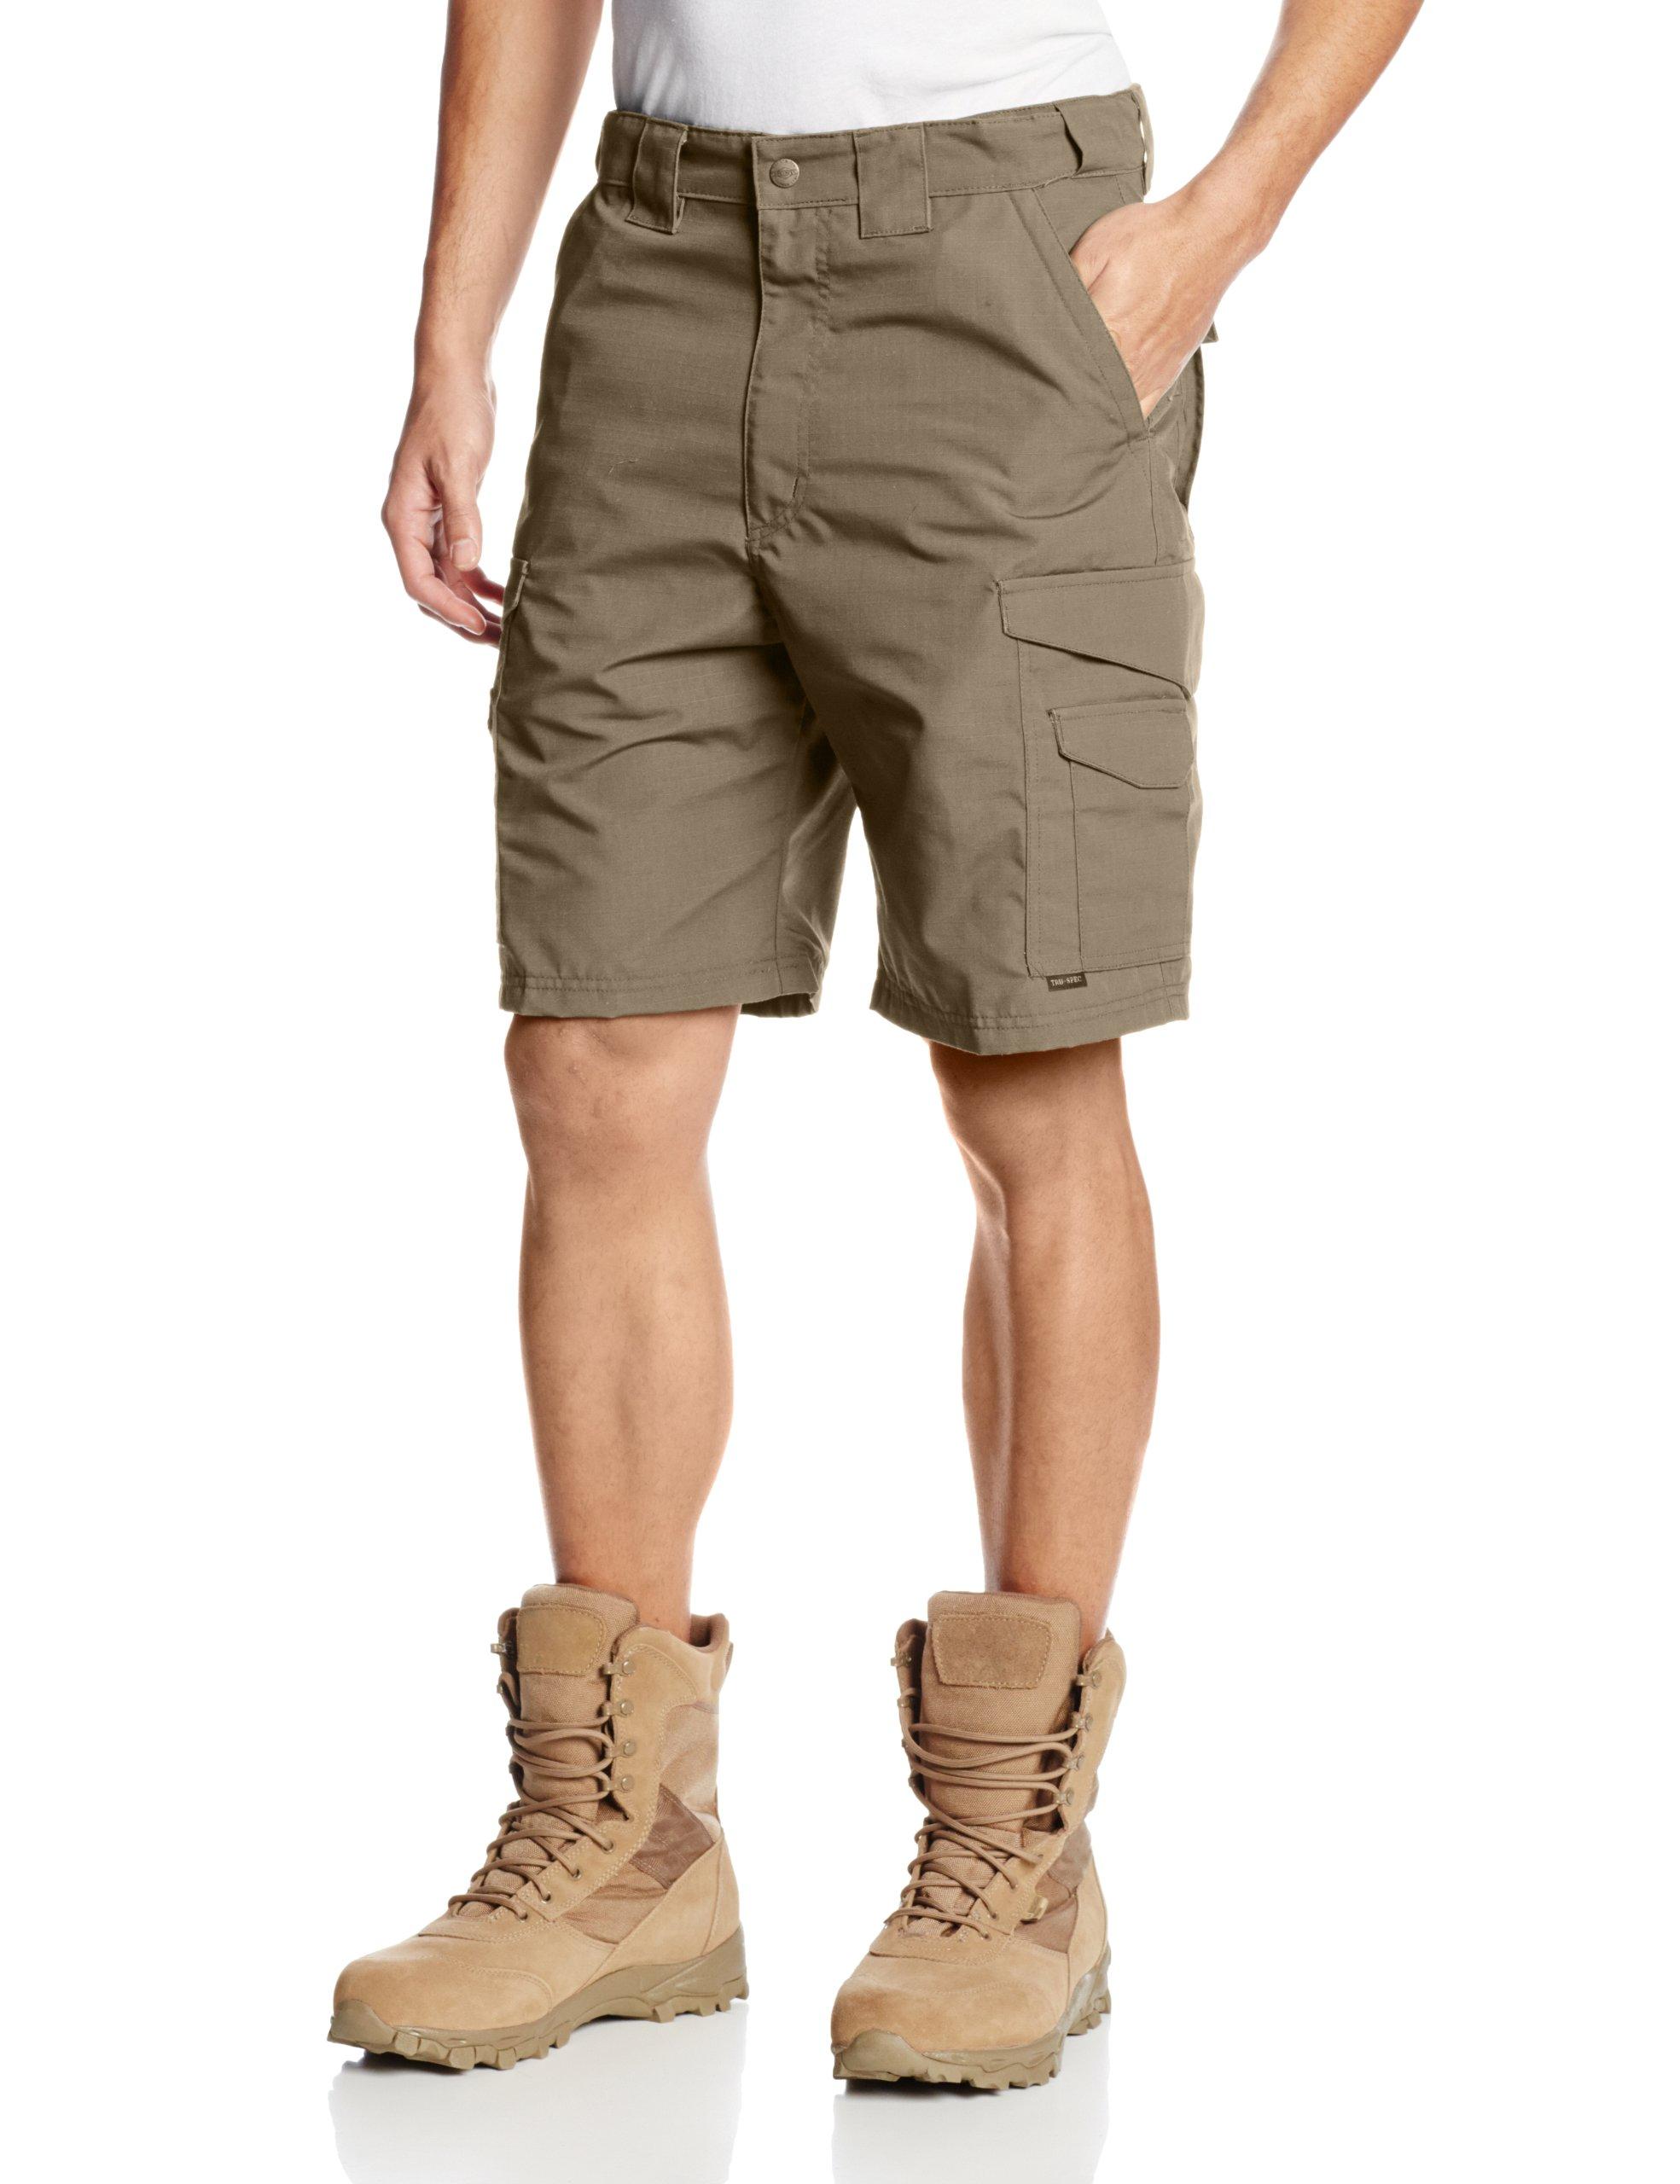 TRU-SPEC Shorts, 24-7 Kh 9'' P/C R/S, Khaki, 38